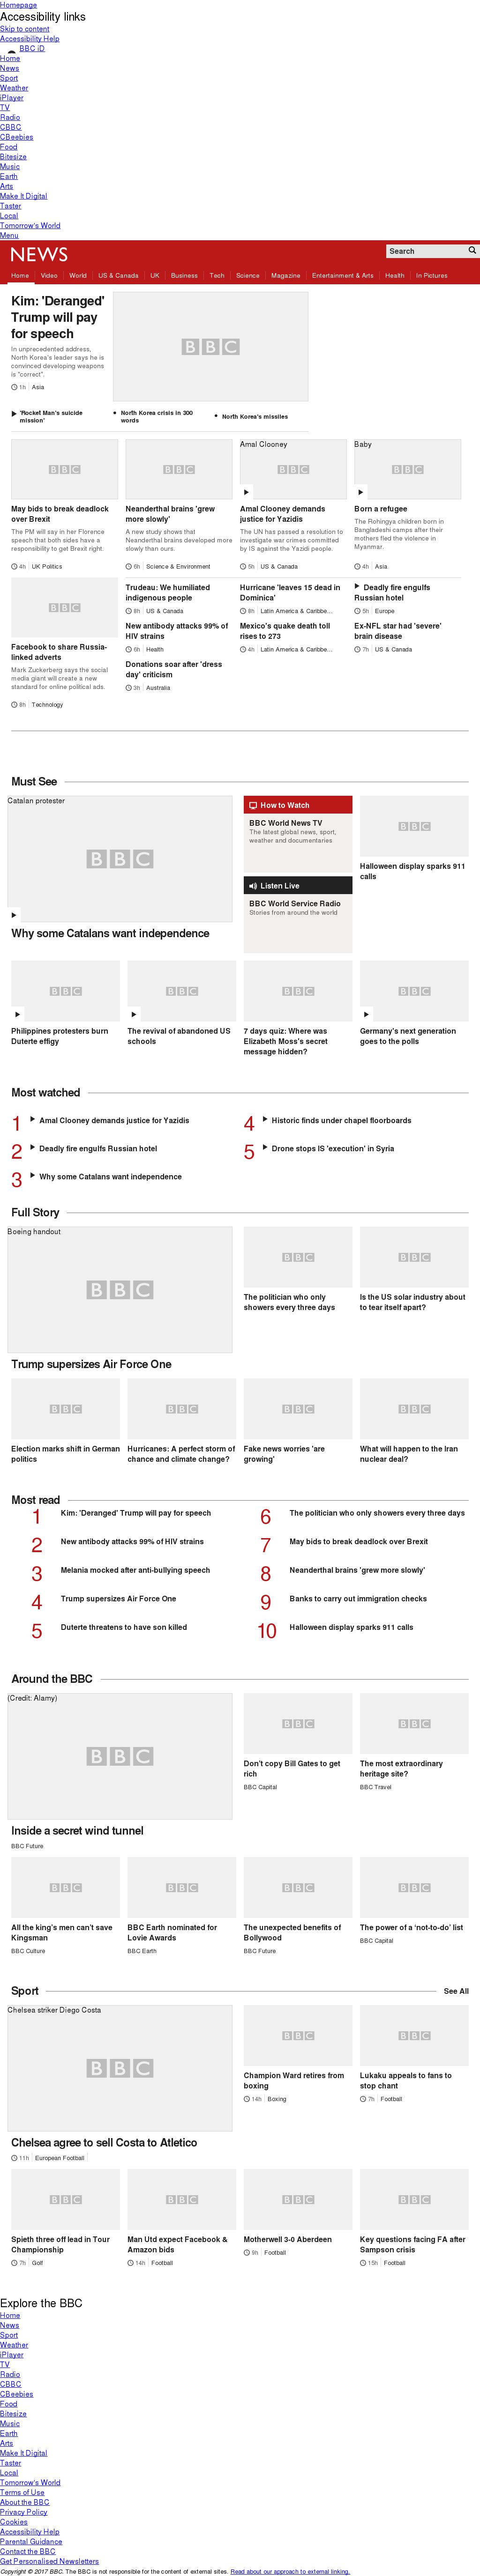 BBC at Friday Sept. 22, 2017, 6 a.m. UTC